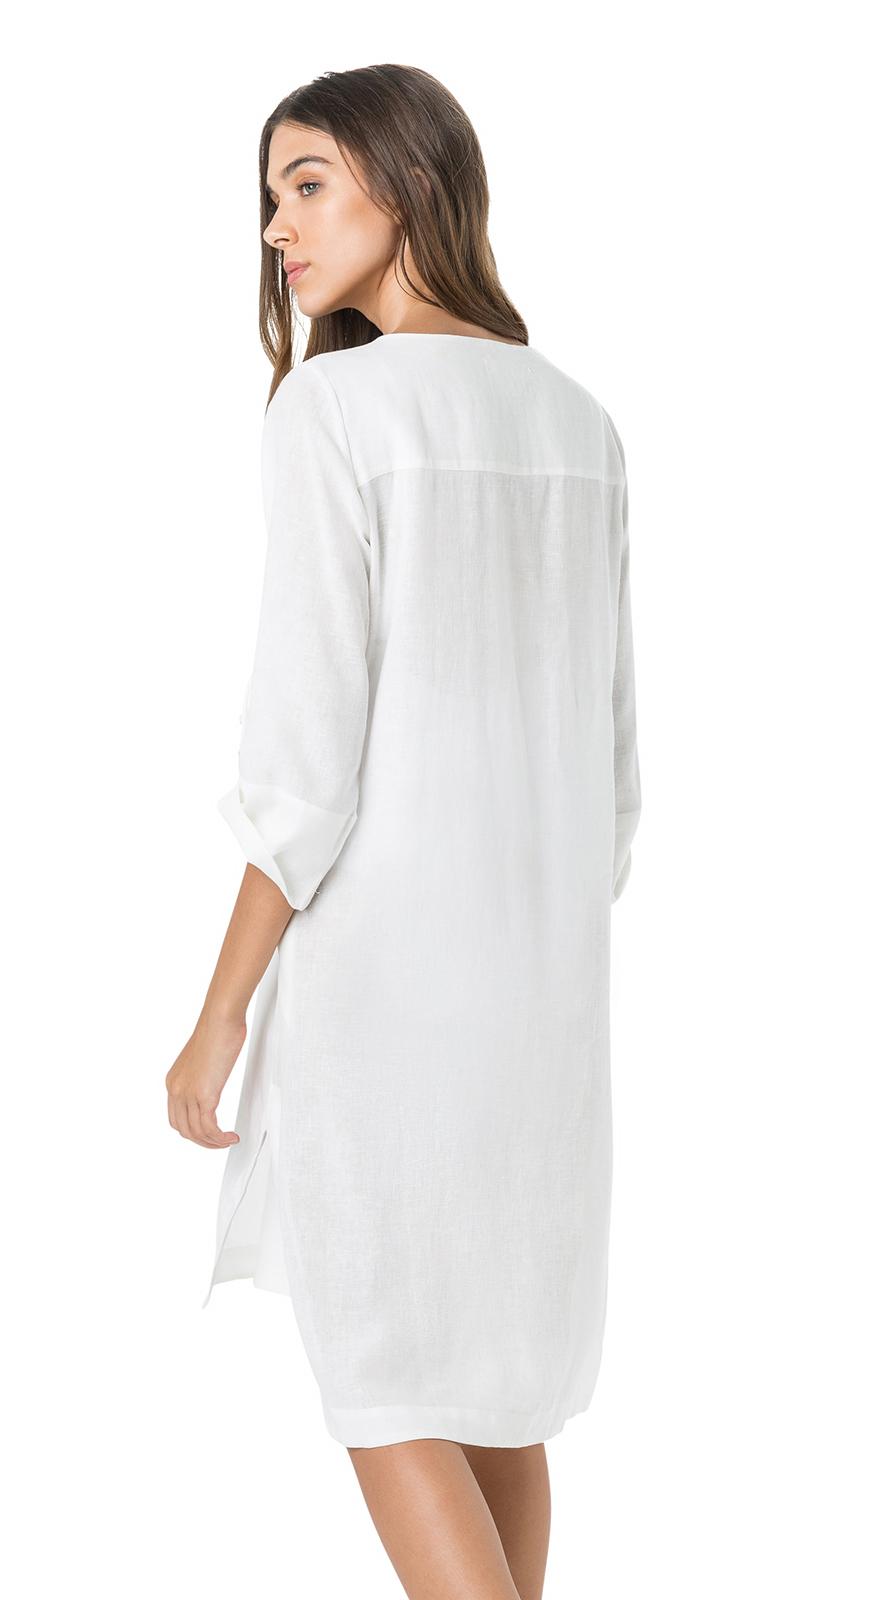 c09d2b134de3 Λευκό φόρεμα παραλίας με ντεκολτέ σε σχήμα V και μανίκι 3 4 - Tunica ...